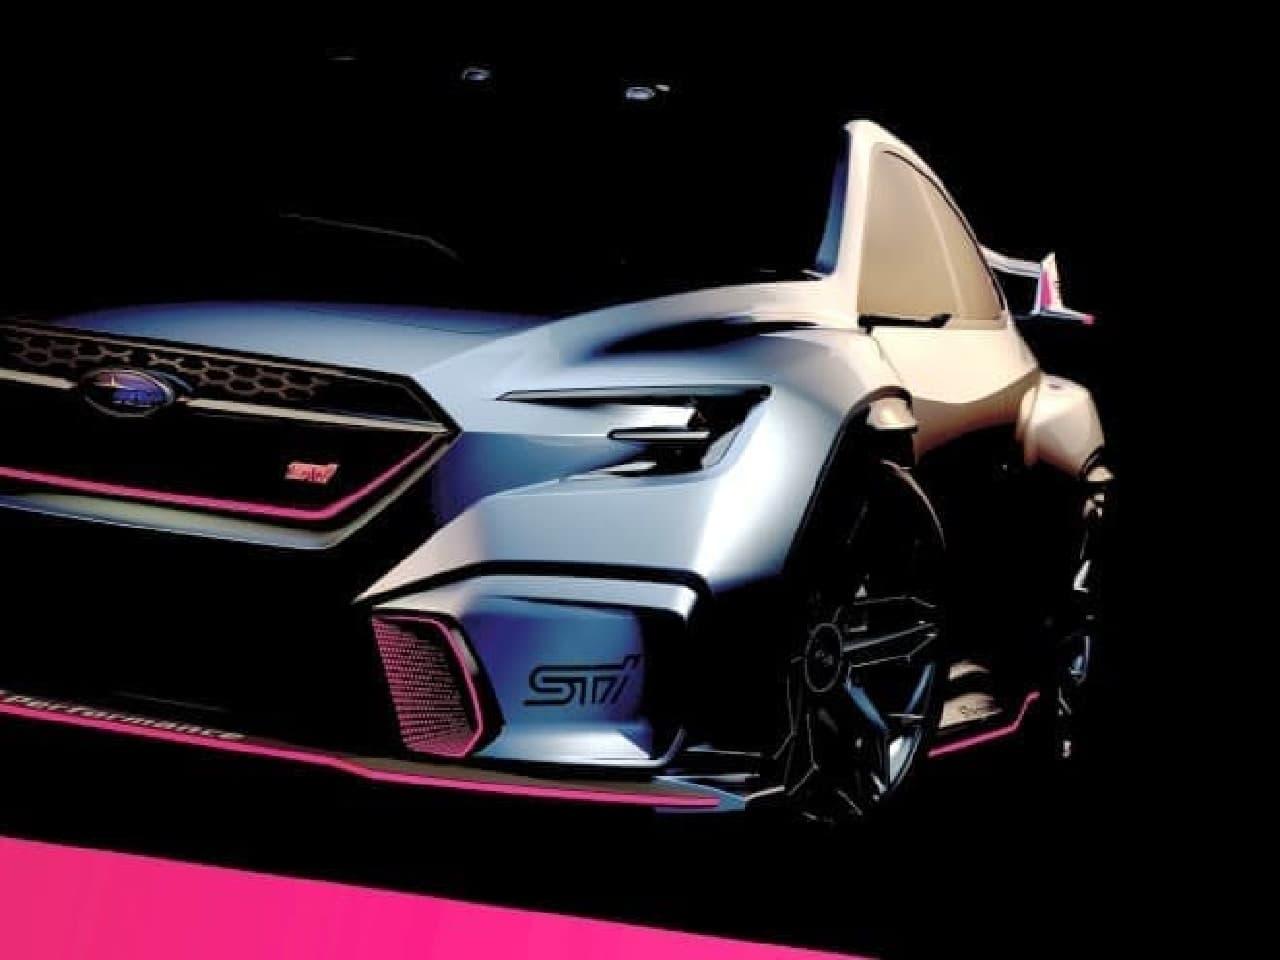 SUBARU、コンセプトカー「SUBARU VIZIV PERFORMANCE STI CONCEPT」を東京オートサロン2018に参考出品